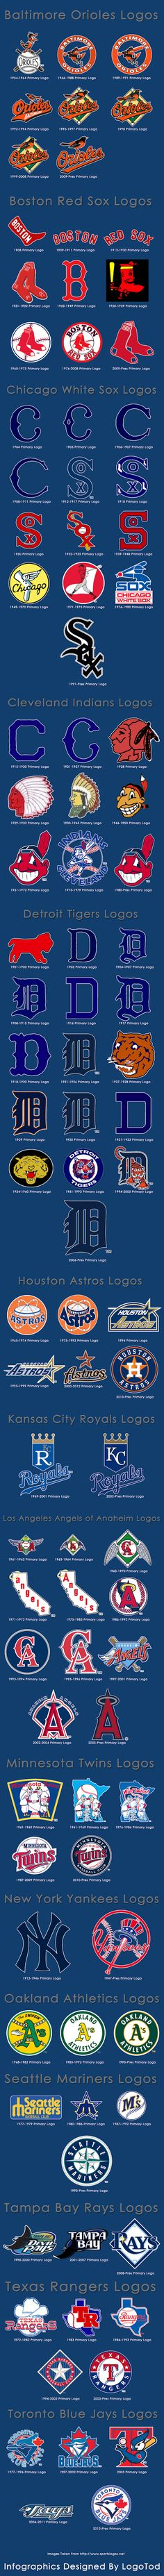 American League team logos, through the years - CBSSports.com